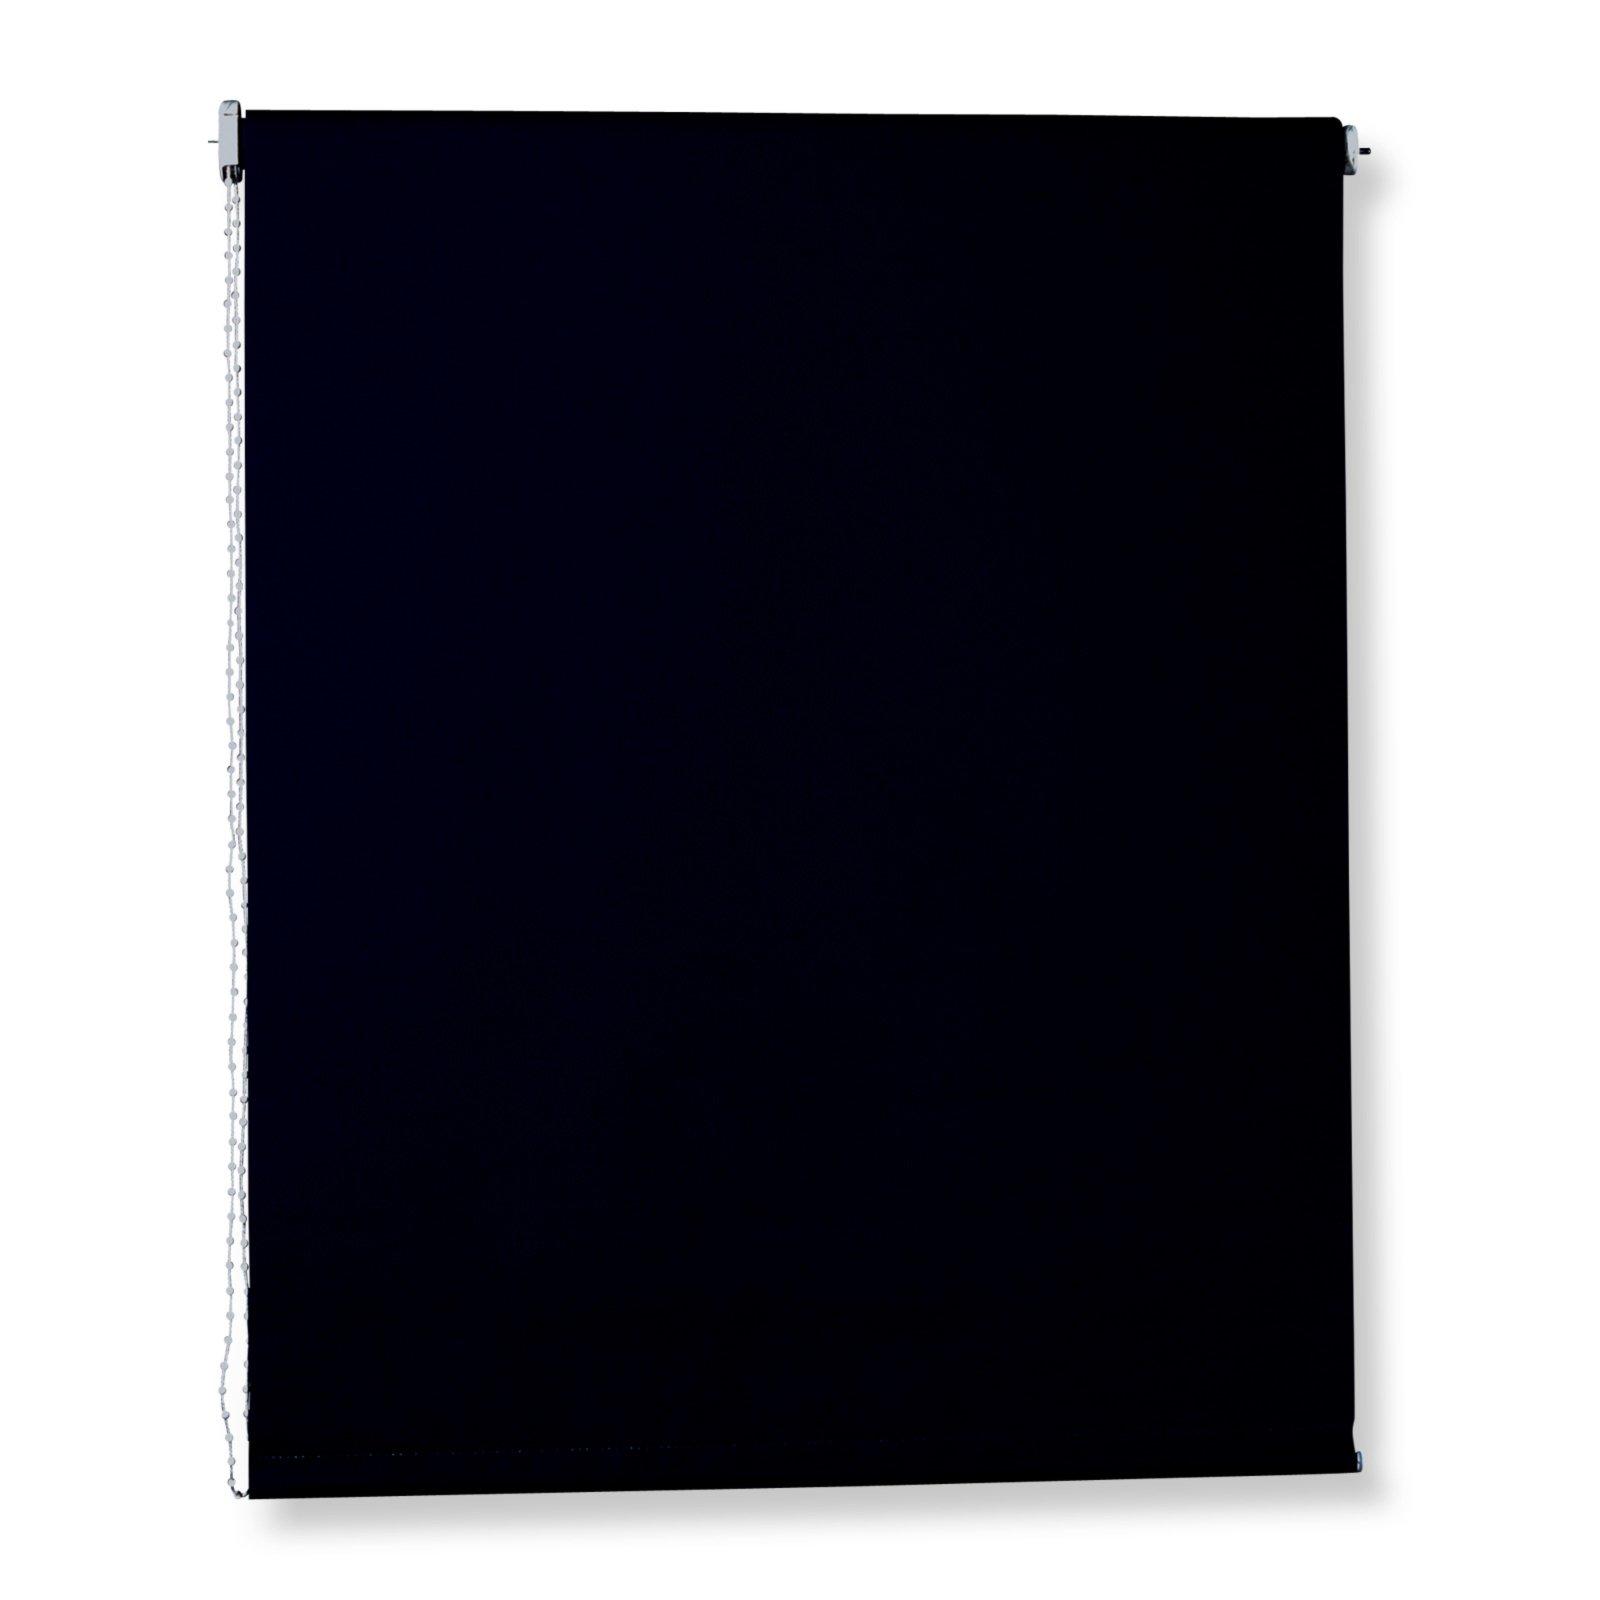 rollo schwarz 140x180 cm sichtschutzrollos rollos. Black Bedroom Furniture Sets. Home Design Ideas